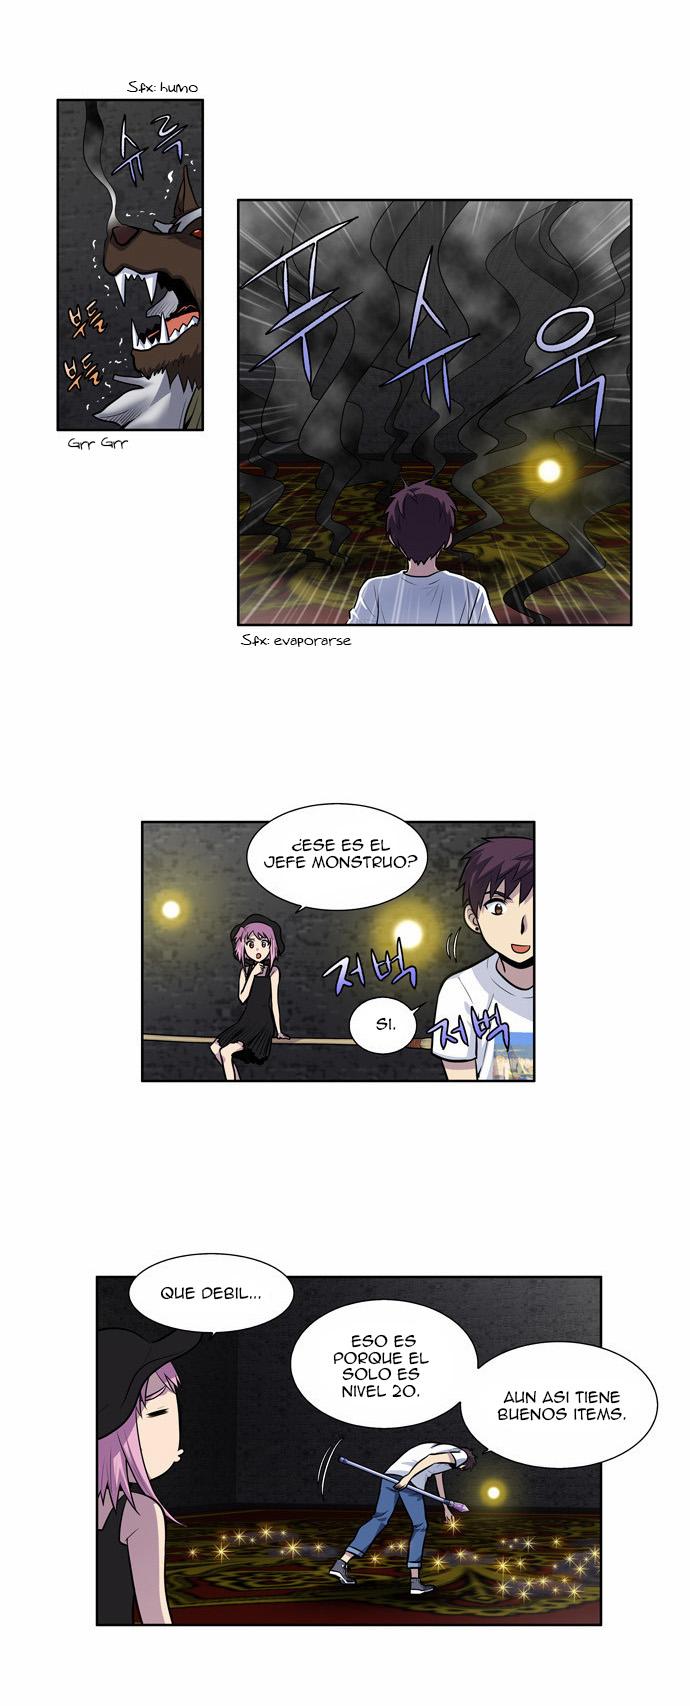 https://c5.ninemanga.com/es_manga/61/1725/416522/4543b6dbb458e8af5648d602a11ba977.jpg Page 3